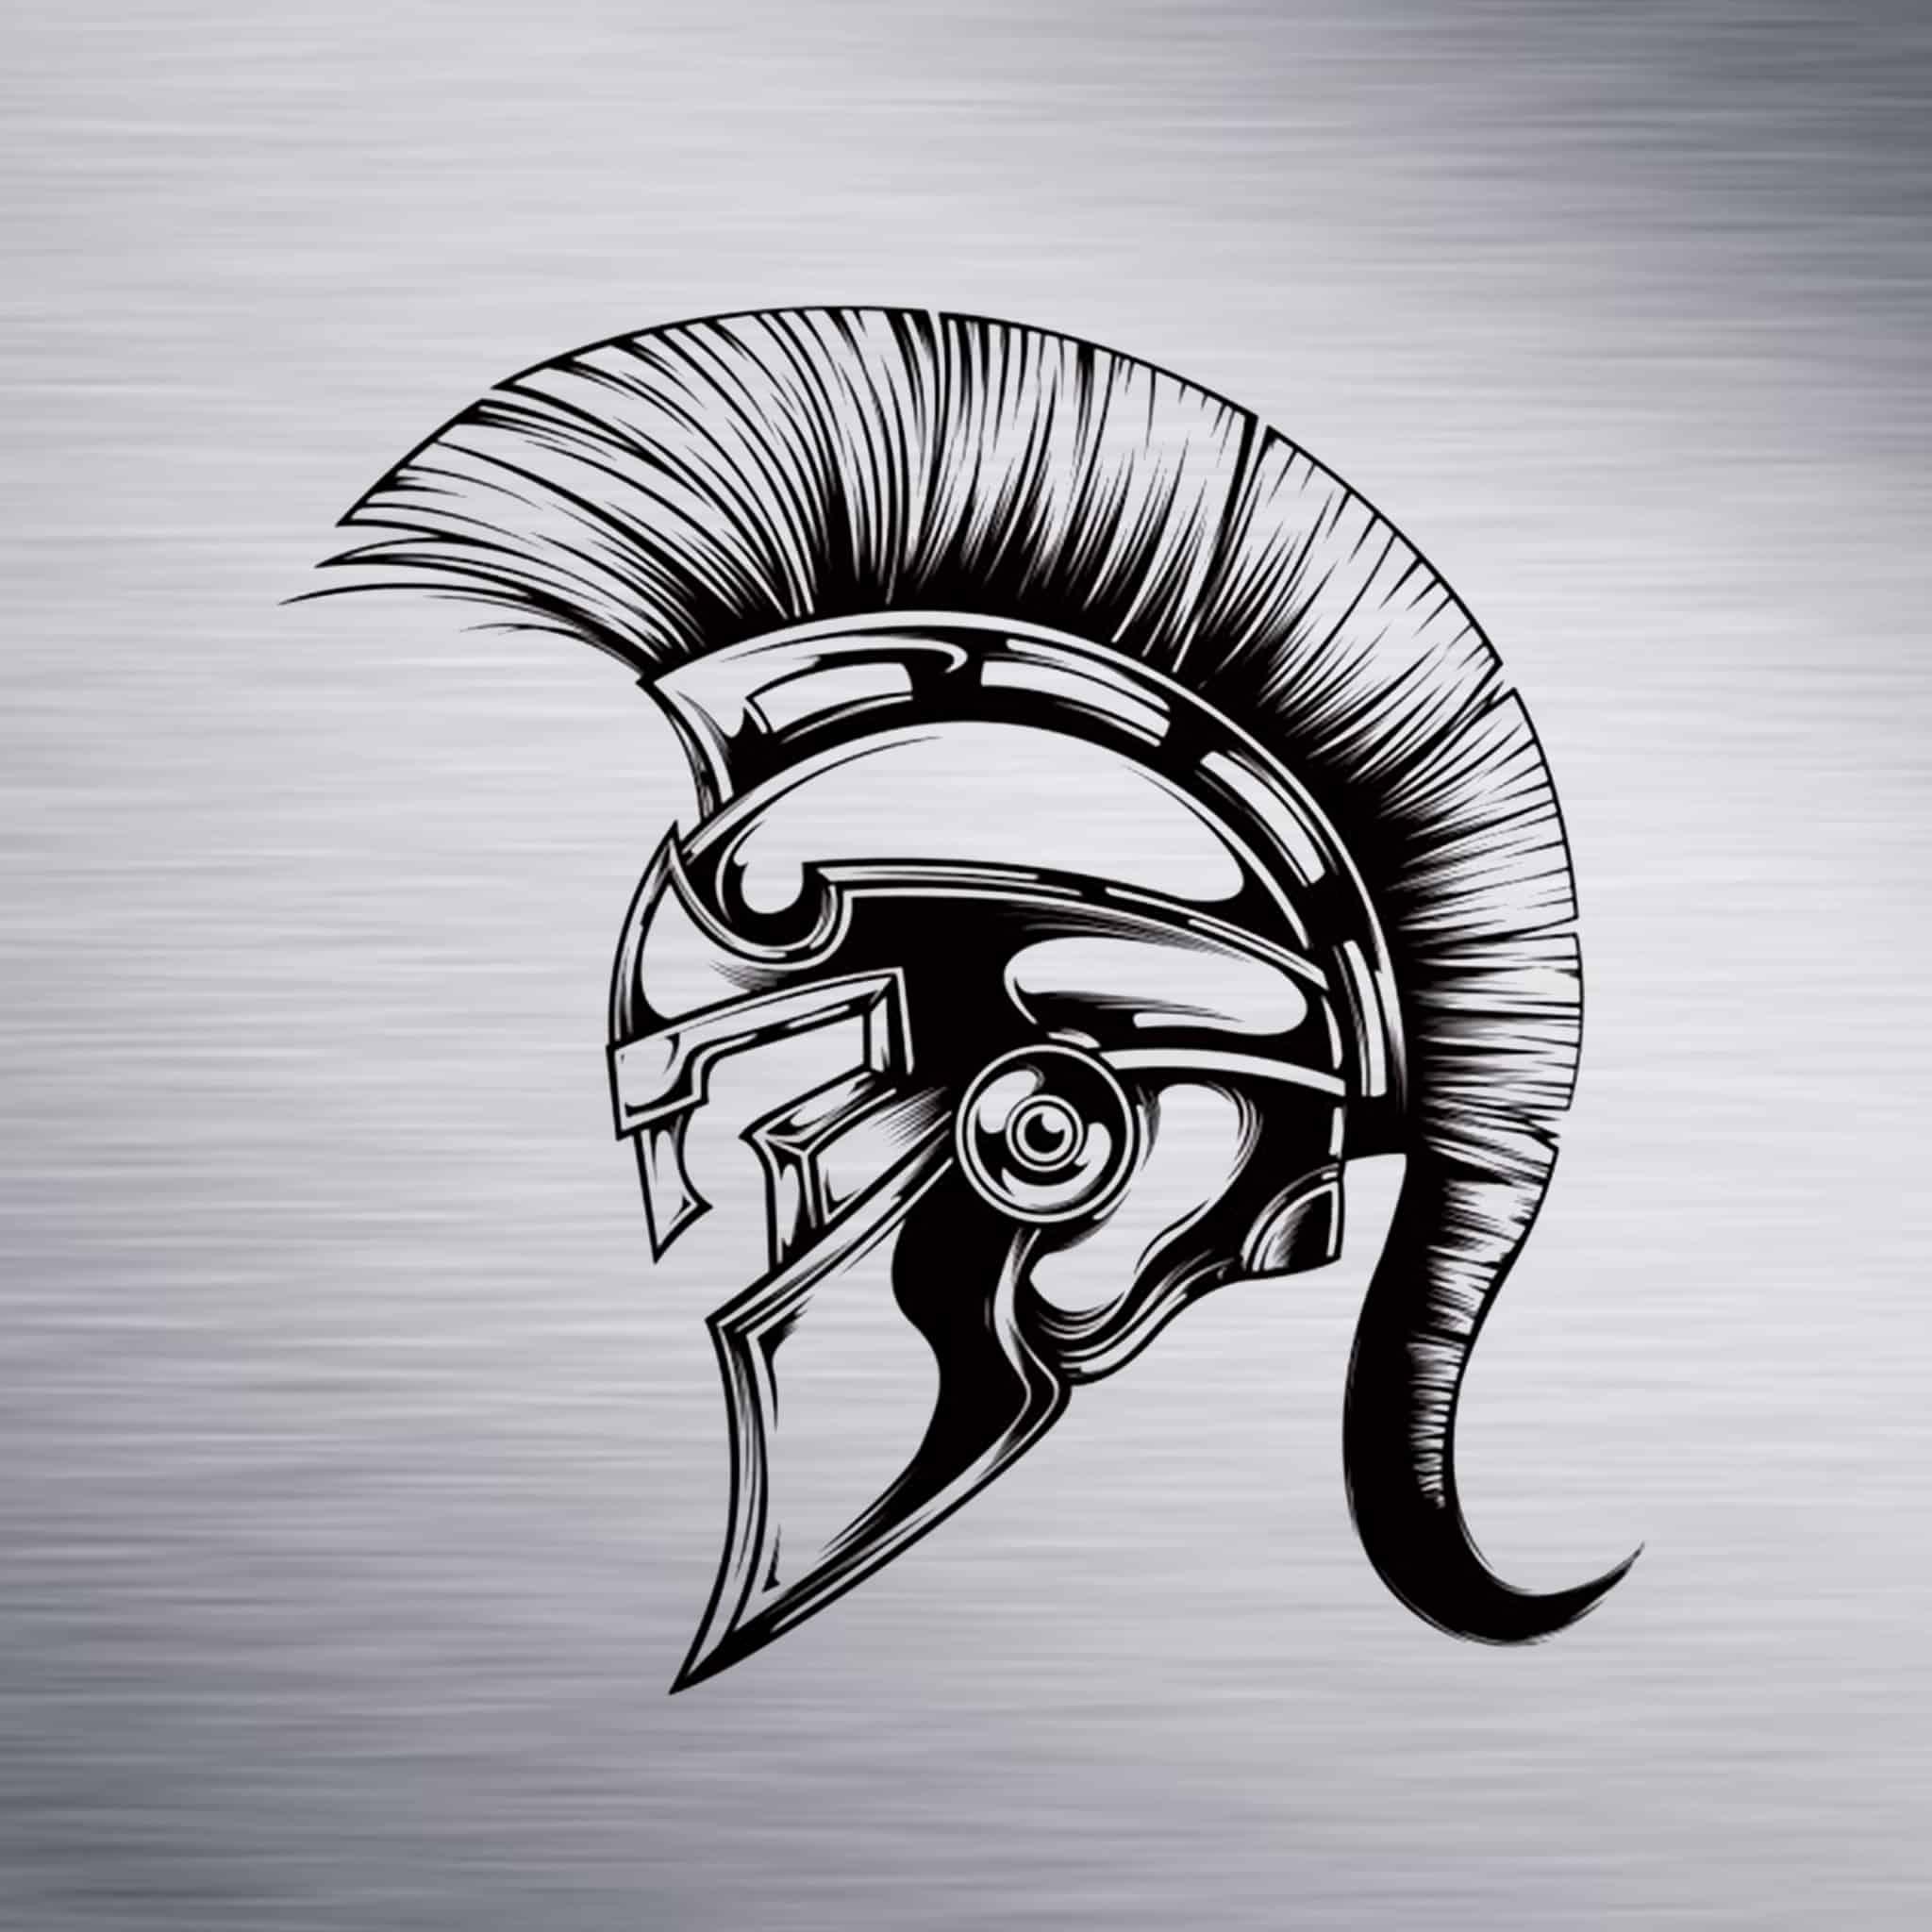 Spartan Helmet Engraving Design